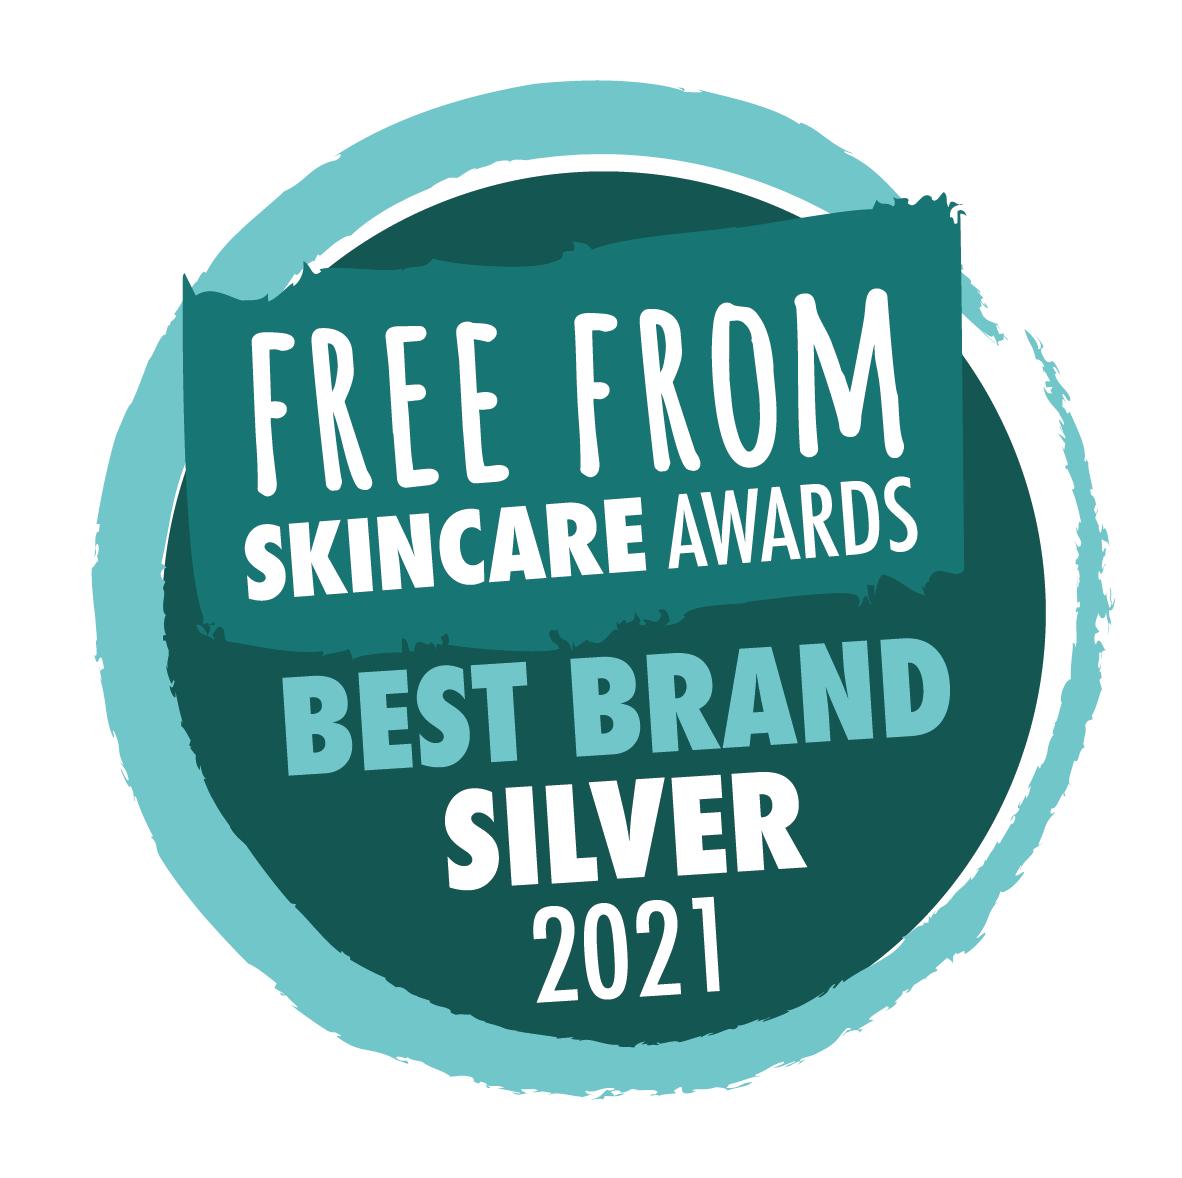 ffsa-best-brand-2021-web-white-background-silver.png